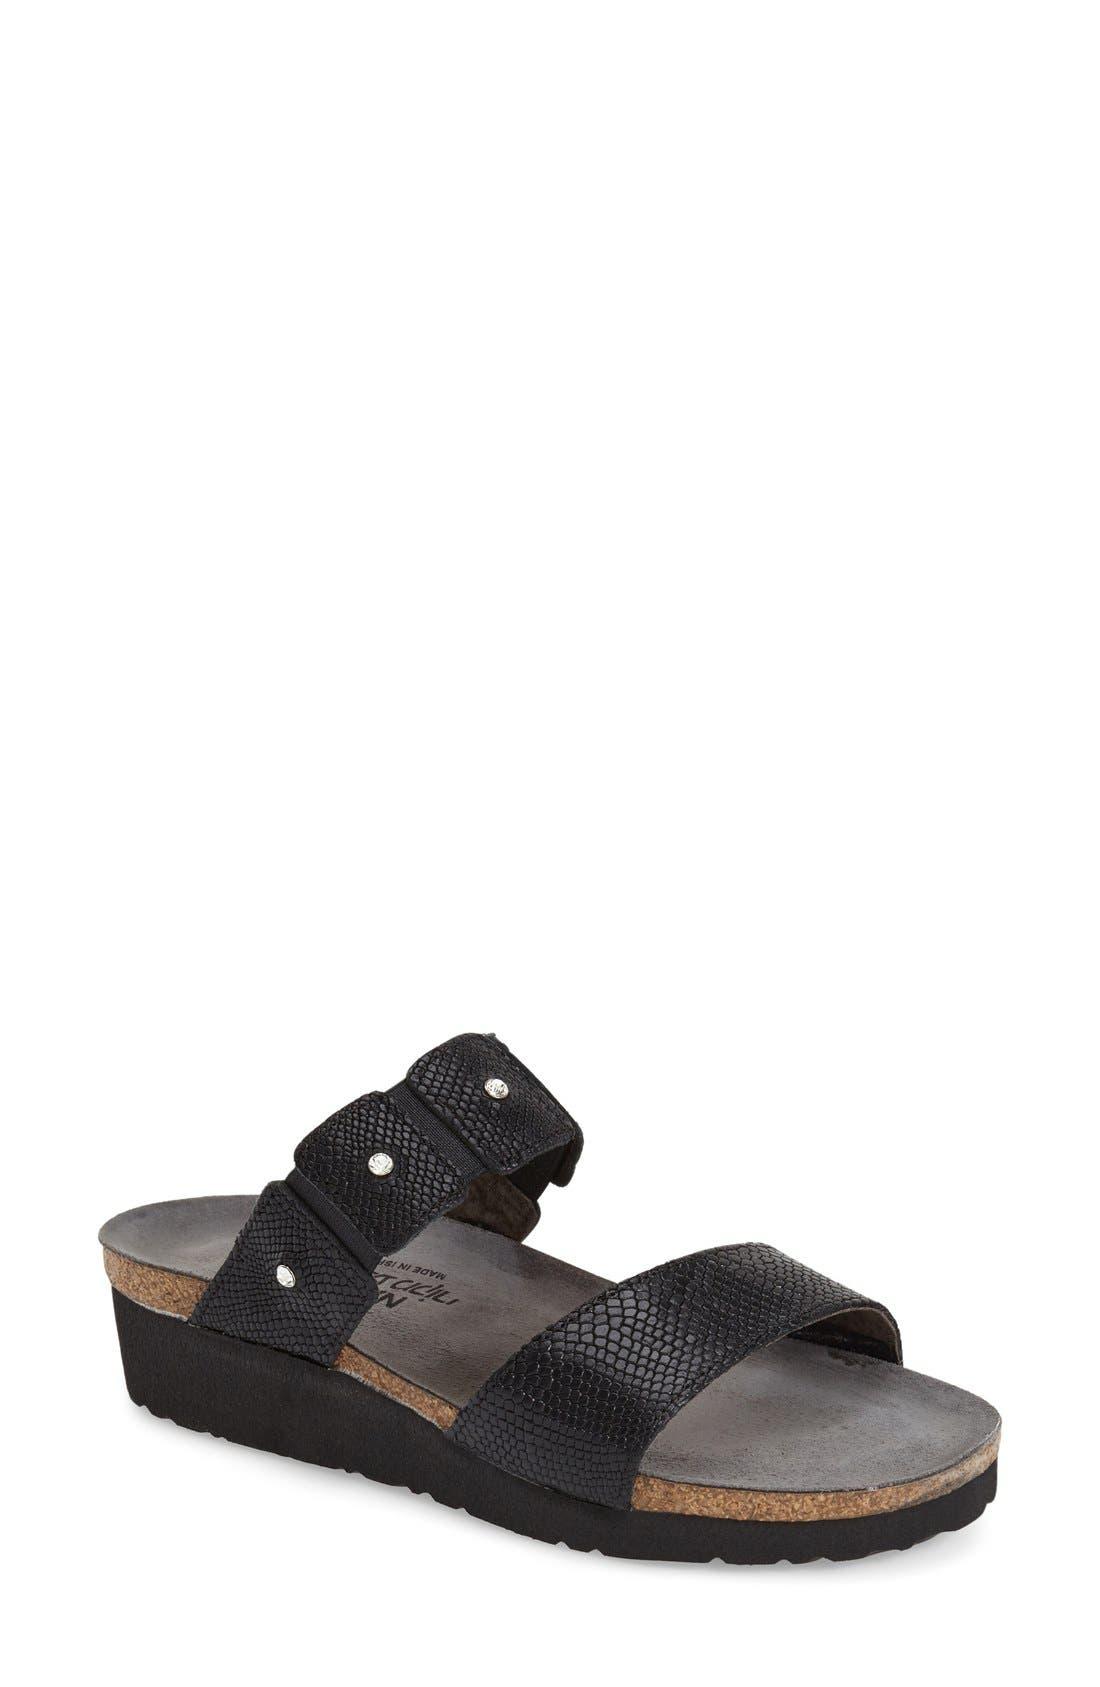 NAOT 'Ashley' Sandal, Main, color, BLACK SNAKE LEATHER